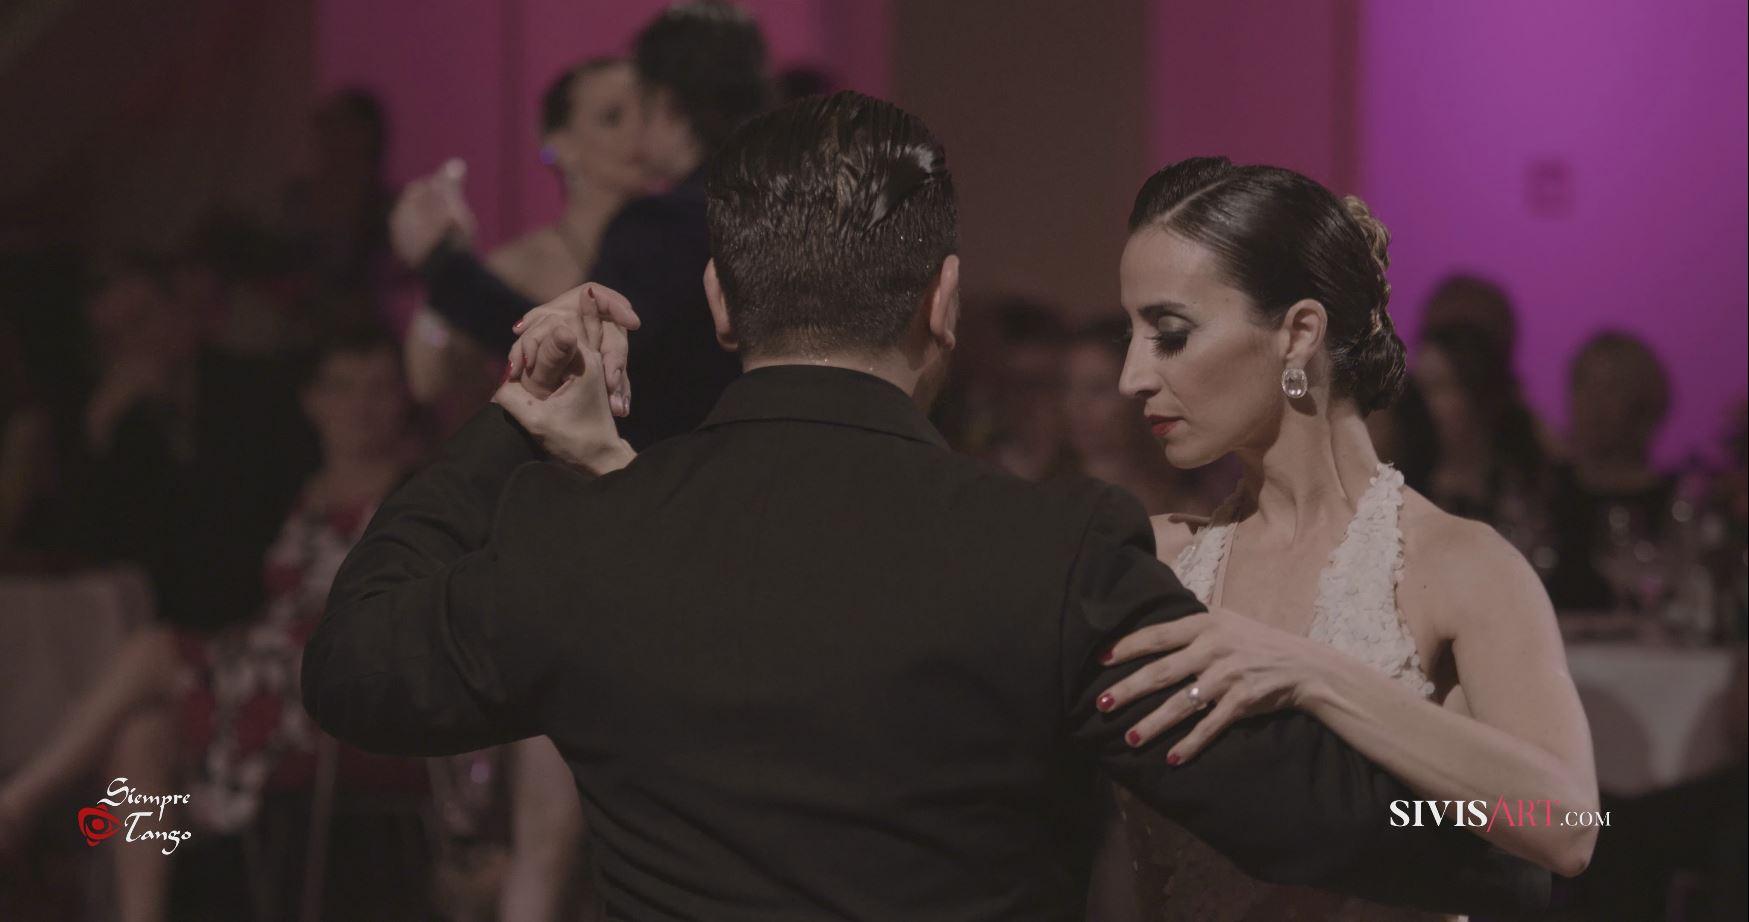 Sivis'art Videomaker presents Natalia Hassan & Leonel Mendieta